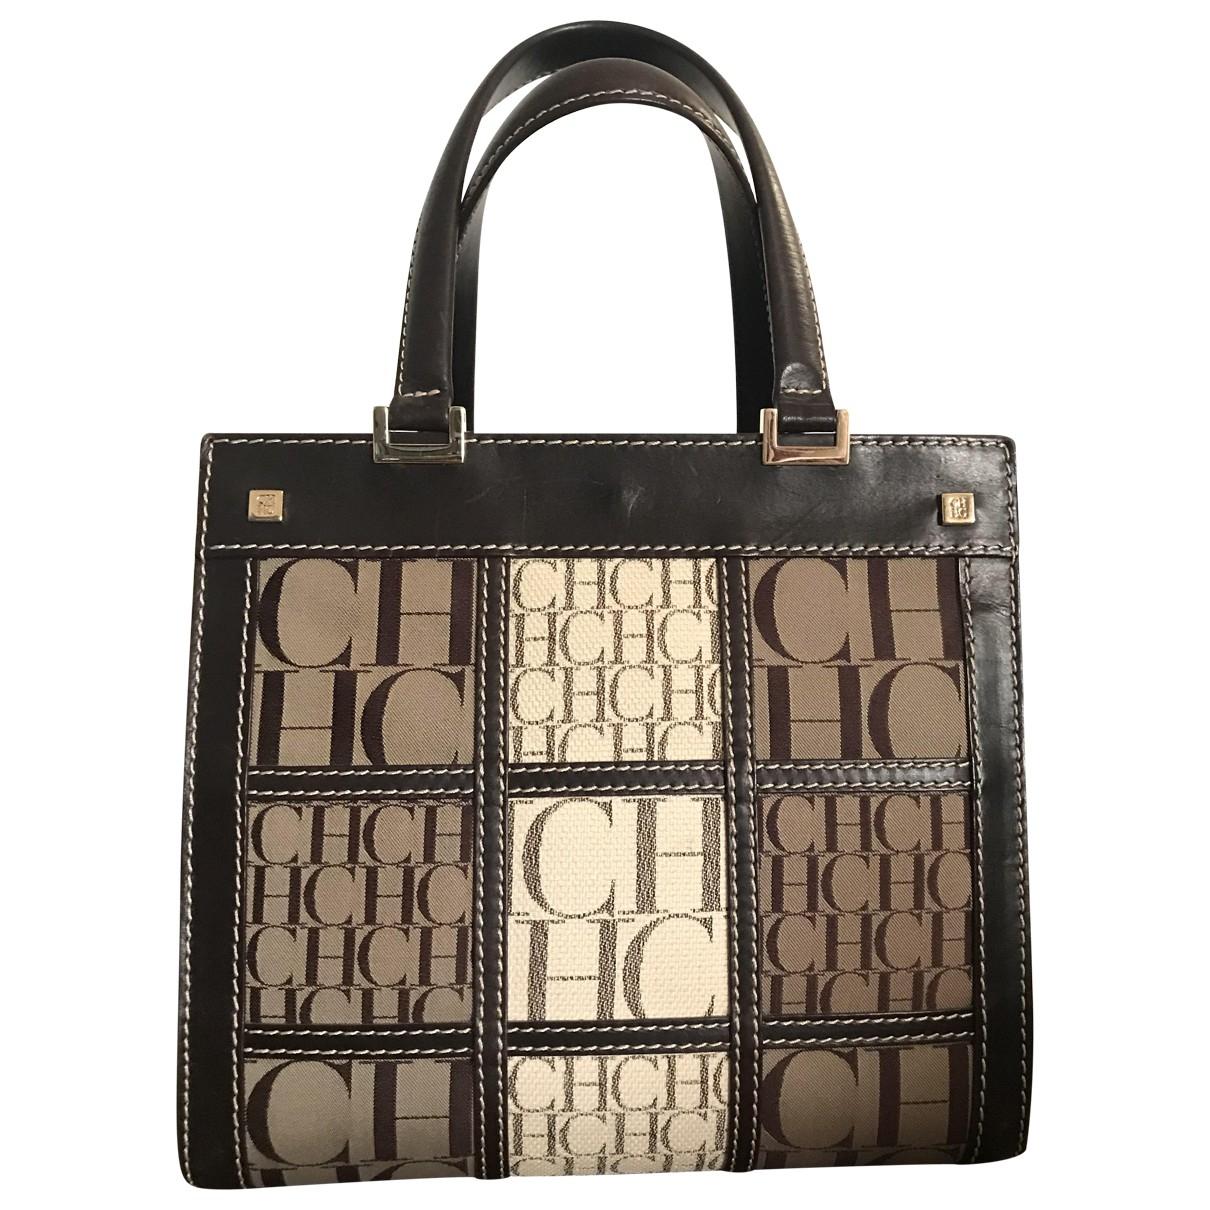 Carolina Herrera \N Black Leather handbag for Women \N